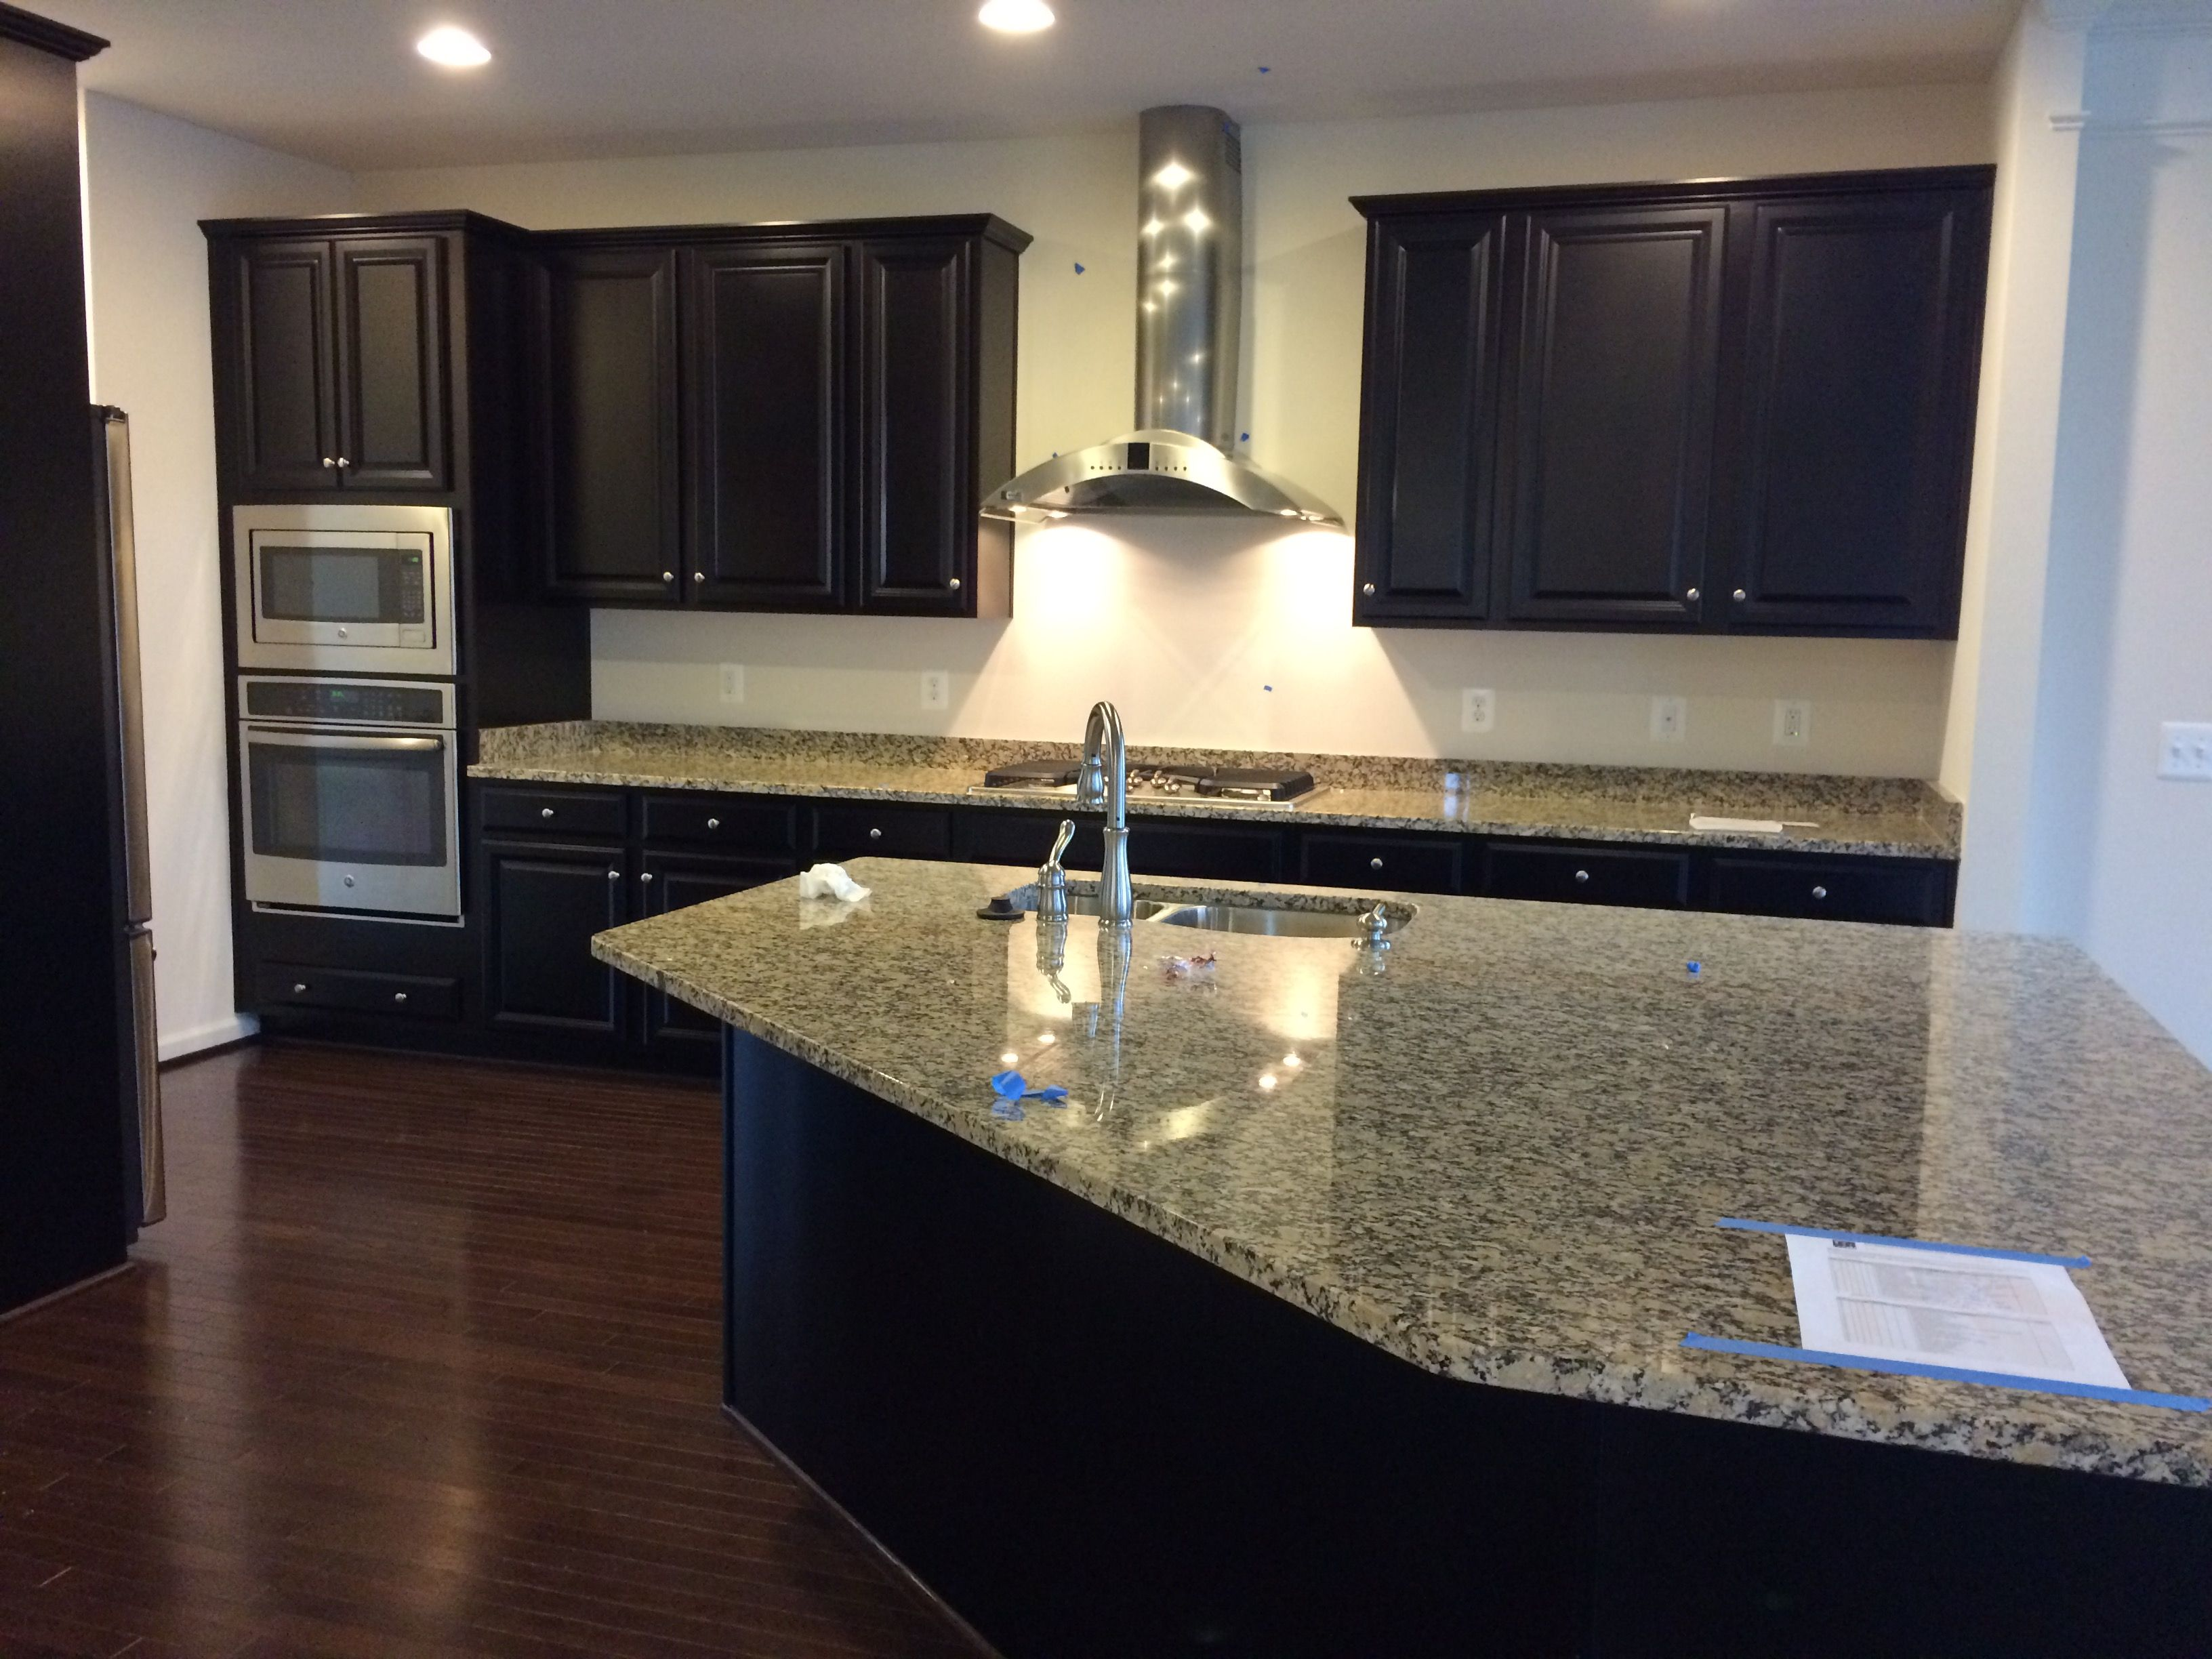 Prefinished Kitchen Cabinets Level 5 Espresso Kitchen Cabinets Level 2 Autumn Beige Granite